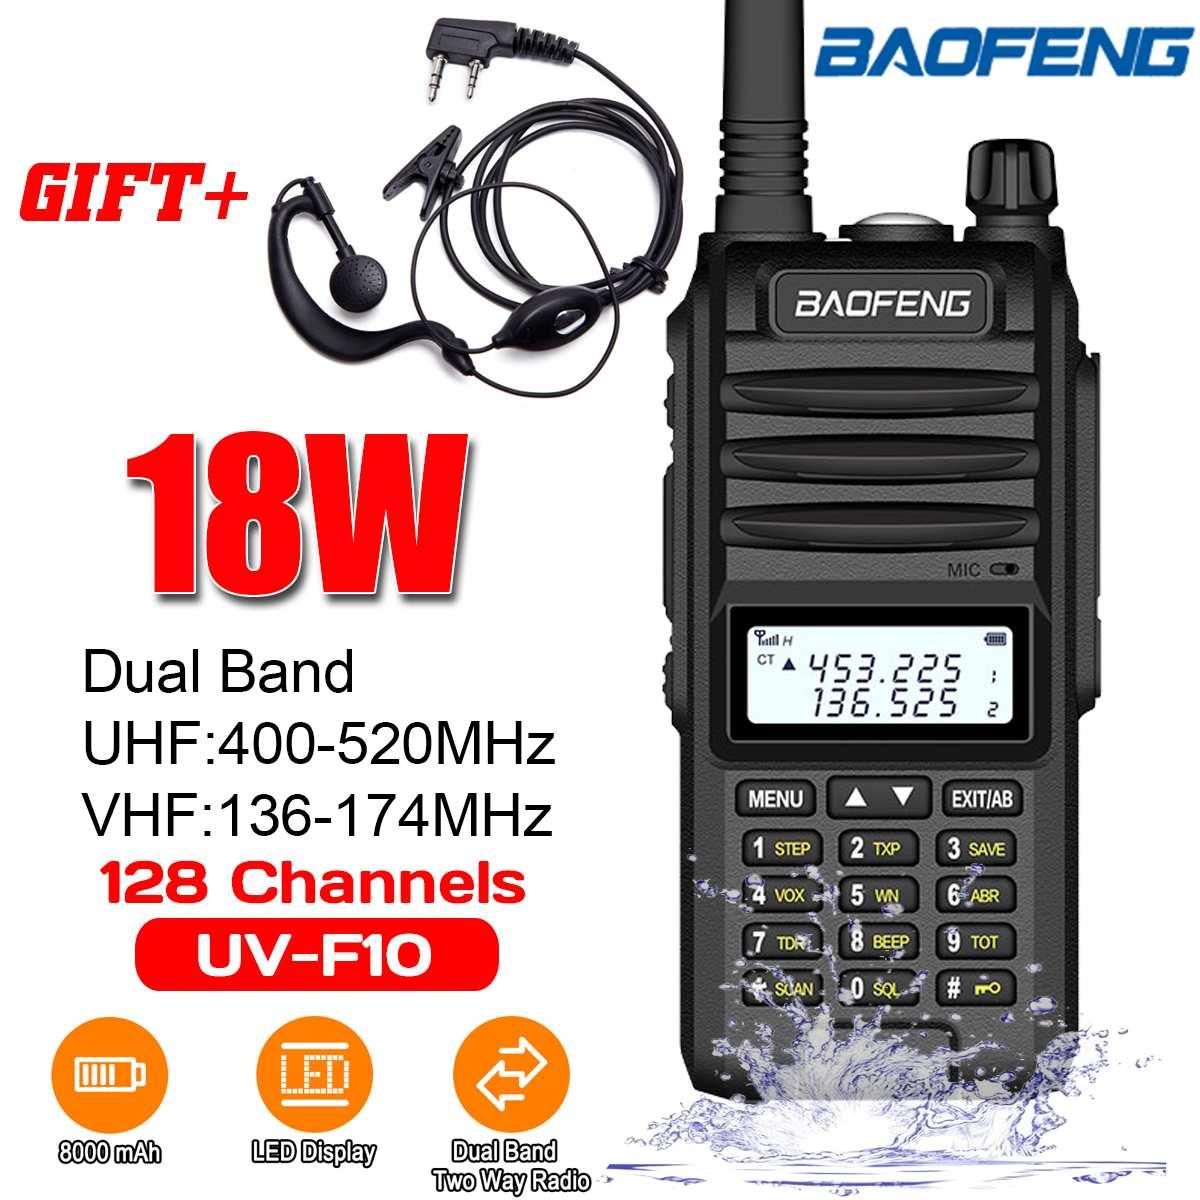 Baofeng BF-UVF10 портативная рация VHF UHF Двухдиапазонная портативная двухсторонняя рация 8 Вт VHF UHF портативная рация 15 км Диапазон разговора 8000 мАч